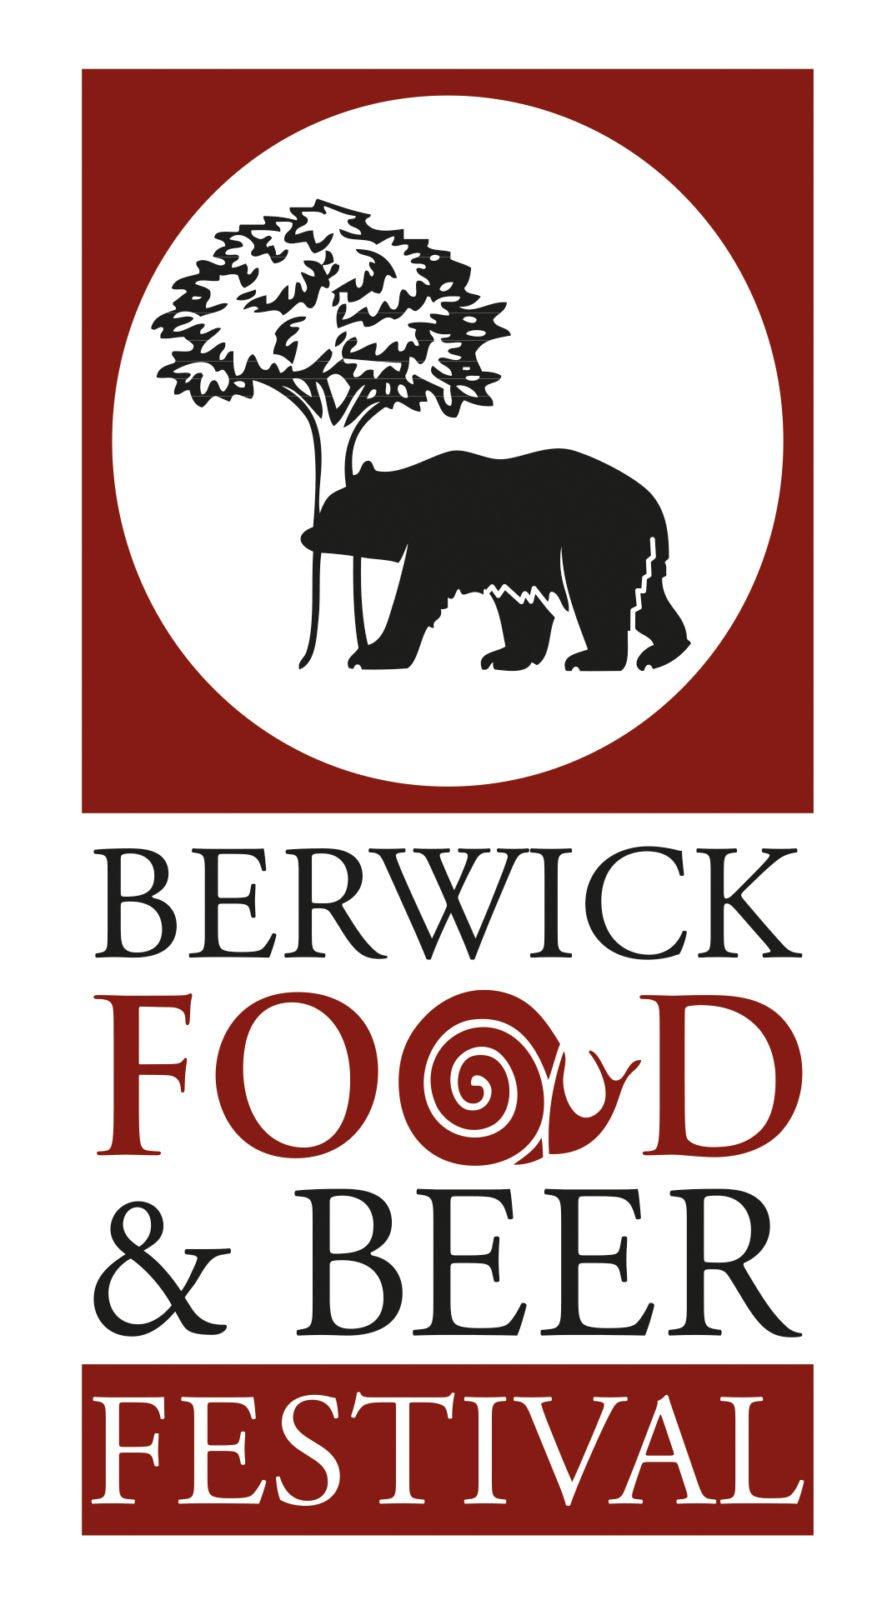 Berwick Food and Beer Festival on 6-8 September